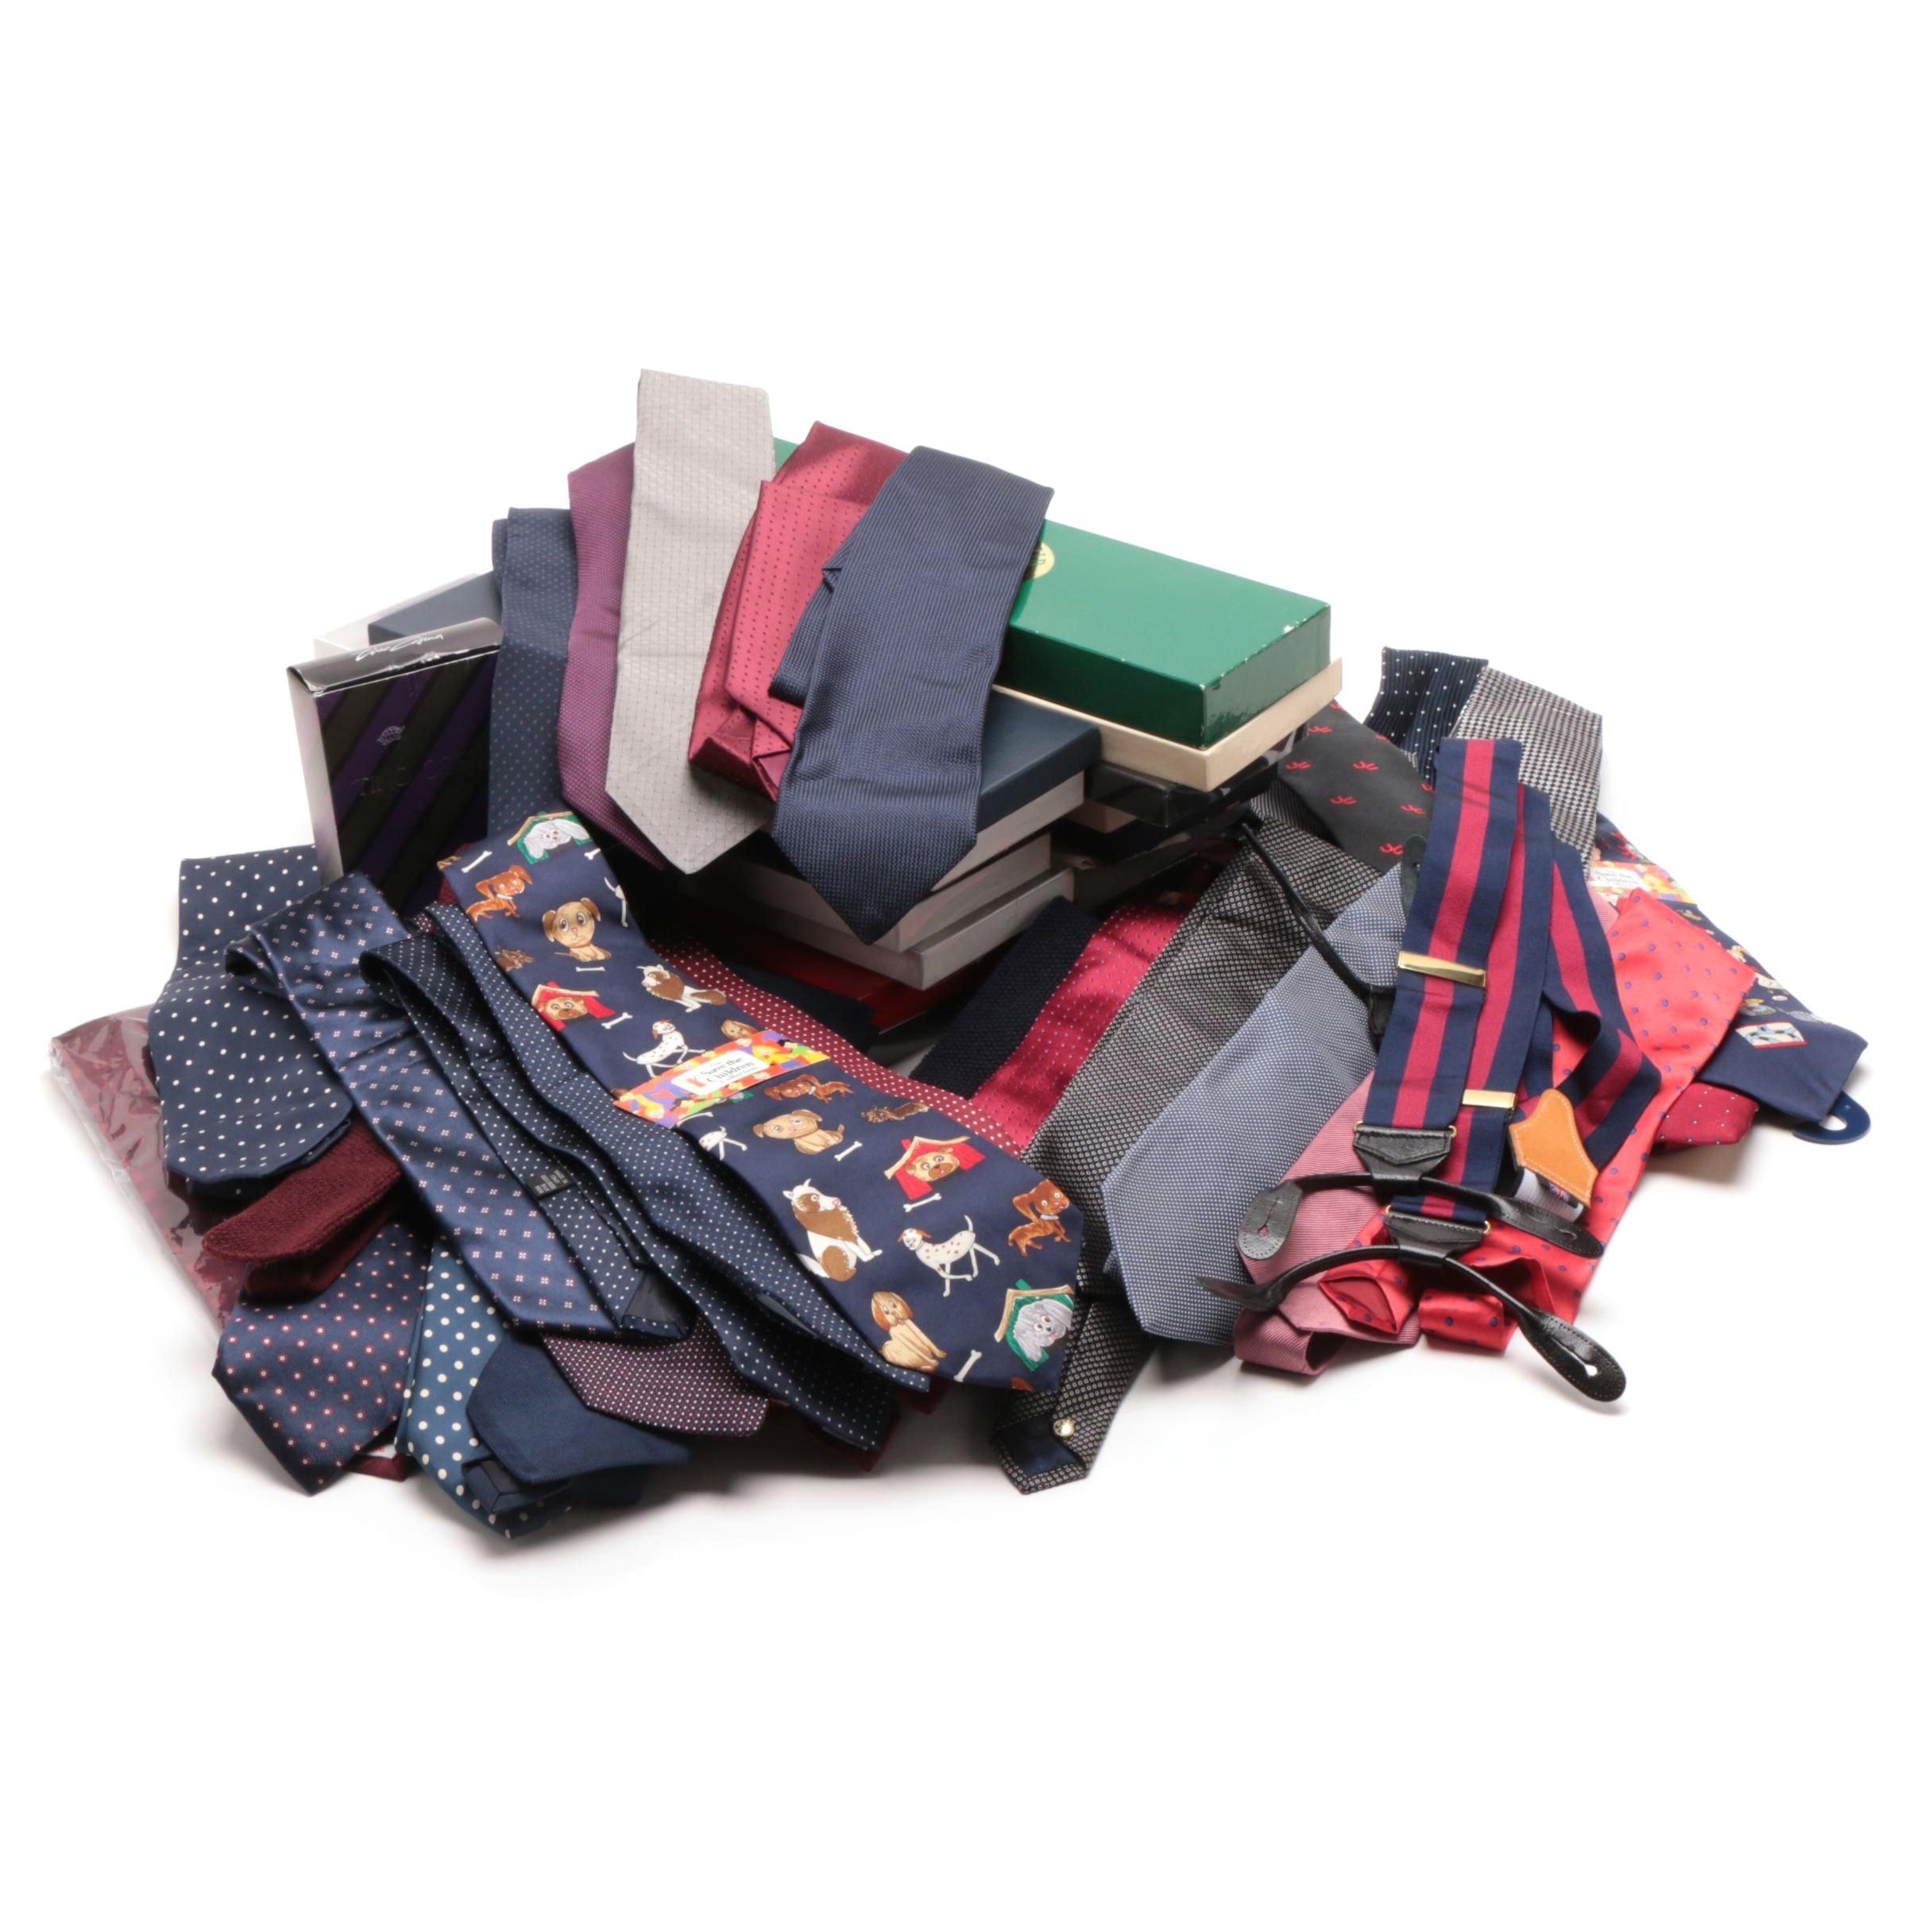 Men's Cotton and Silk Neckties and Suspenders including Paul Stuart